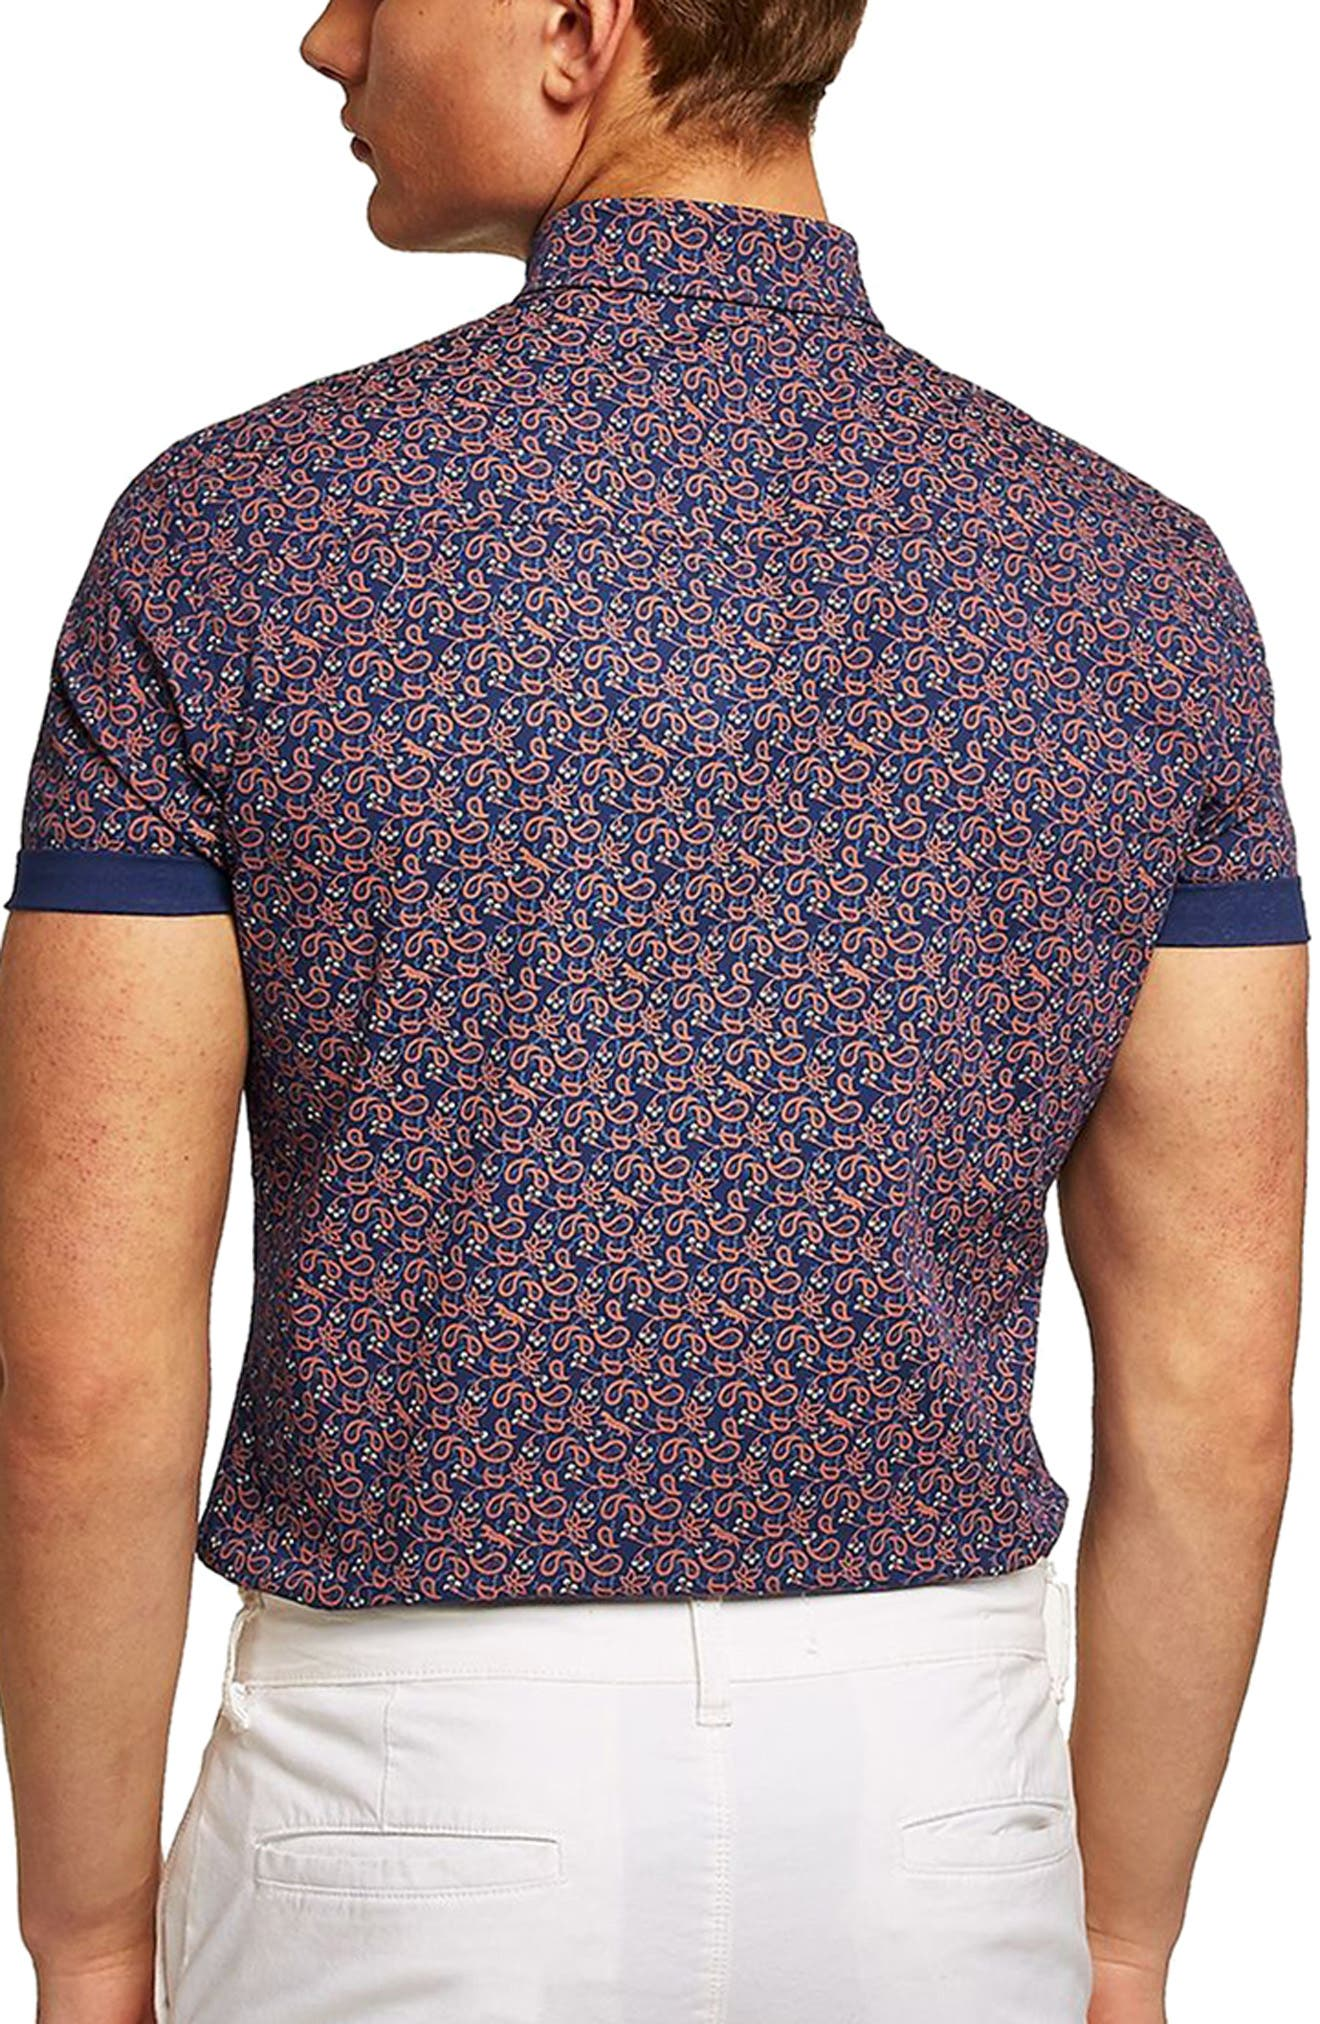 TOPMAN,                             Muscle Fit Eclectic Paisley Print Shirt,                             Alternate thumbnail 2, color,                             400